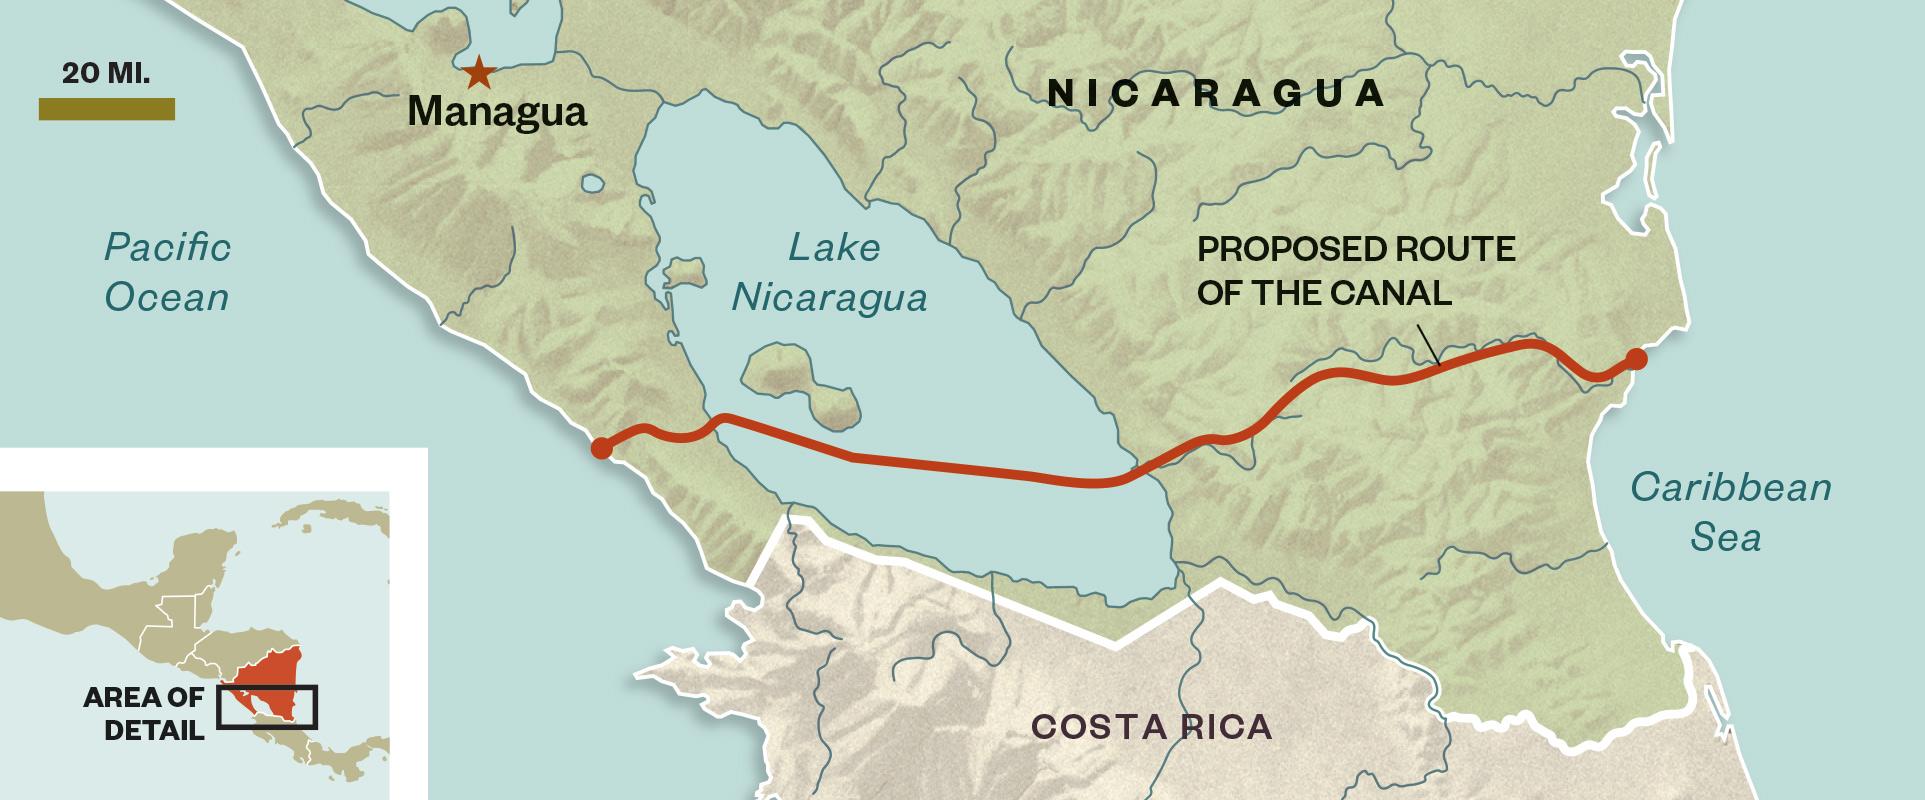 Nicaragua channel